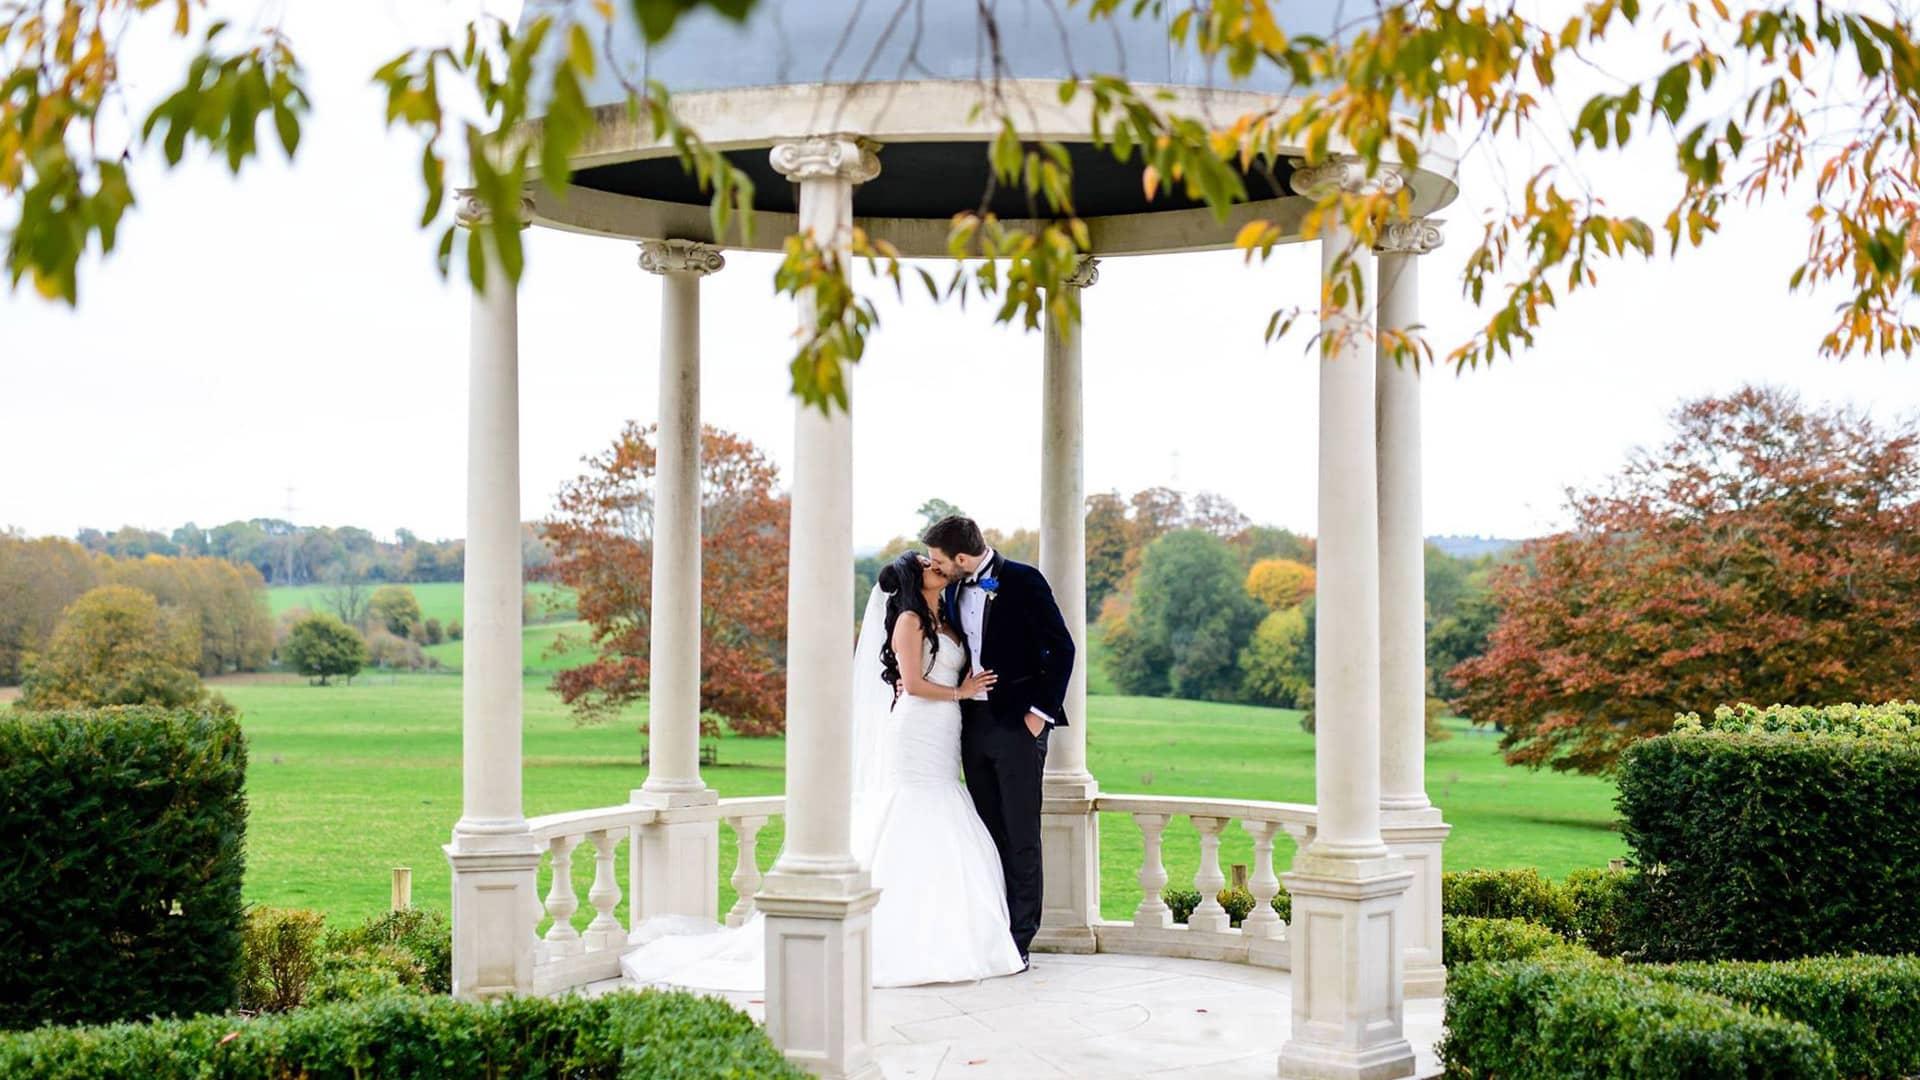 Sharn eoin wedding videography